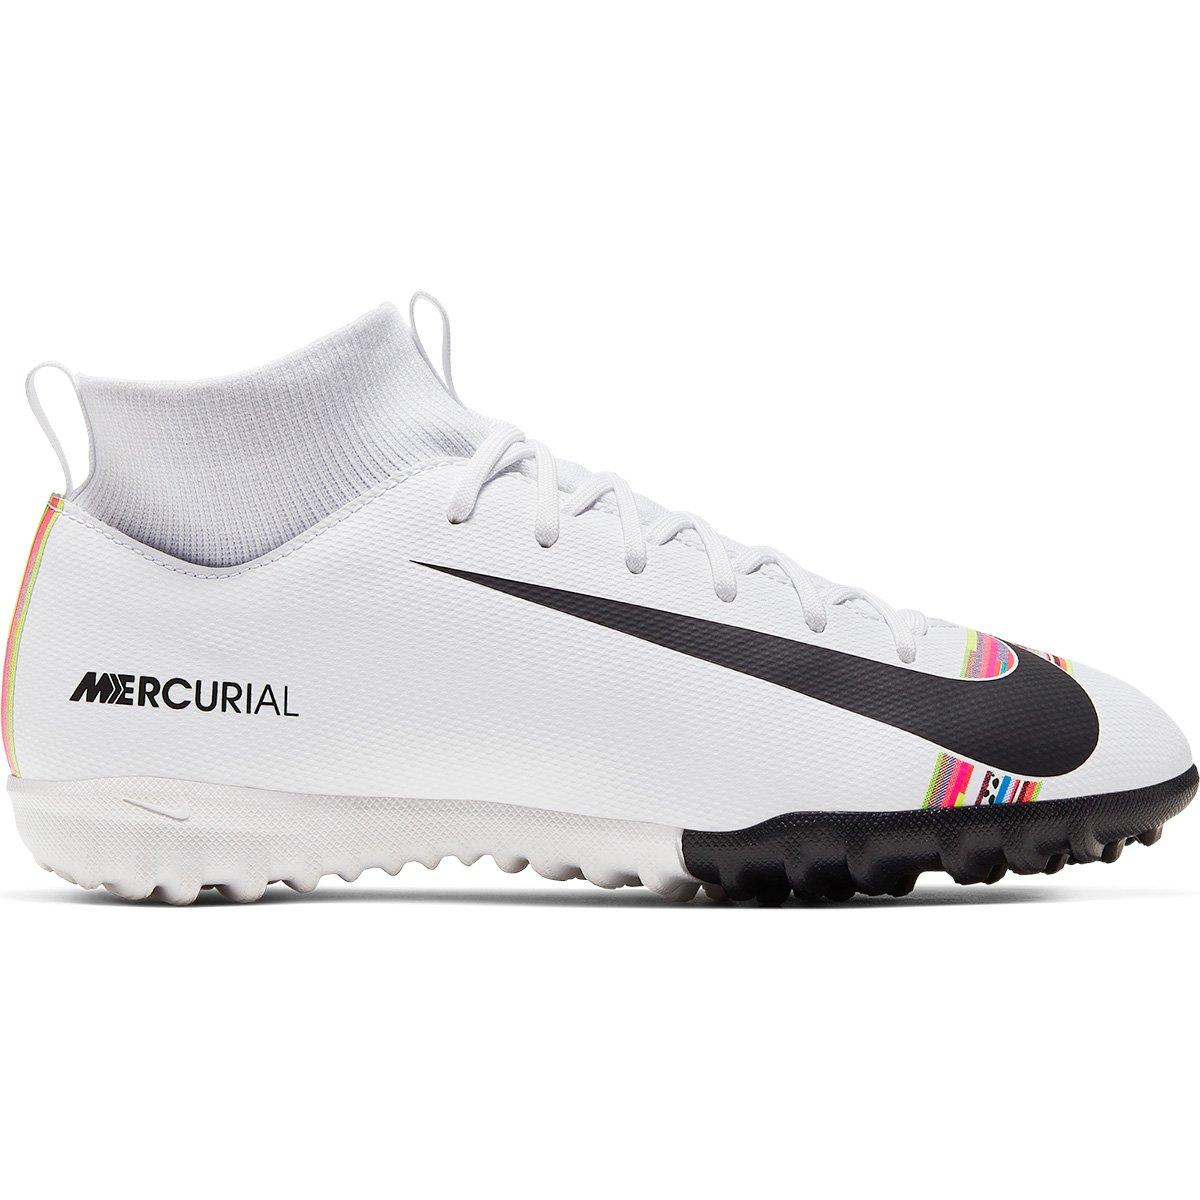 bbd86740a6e Chuteira Society Infantil Nike Mercurial Superfly 6 Academy GS CR7 TF